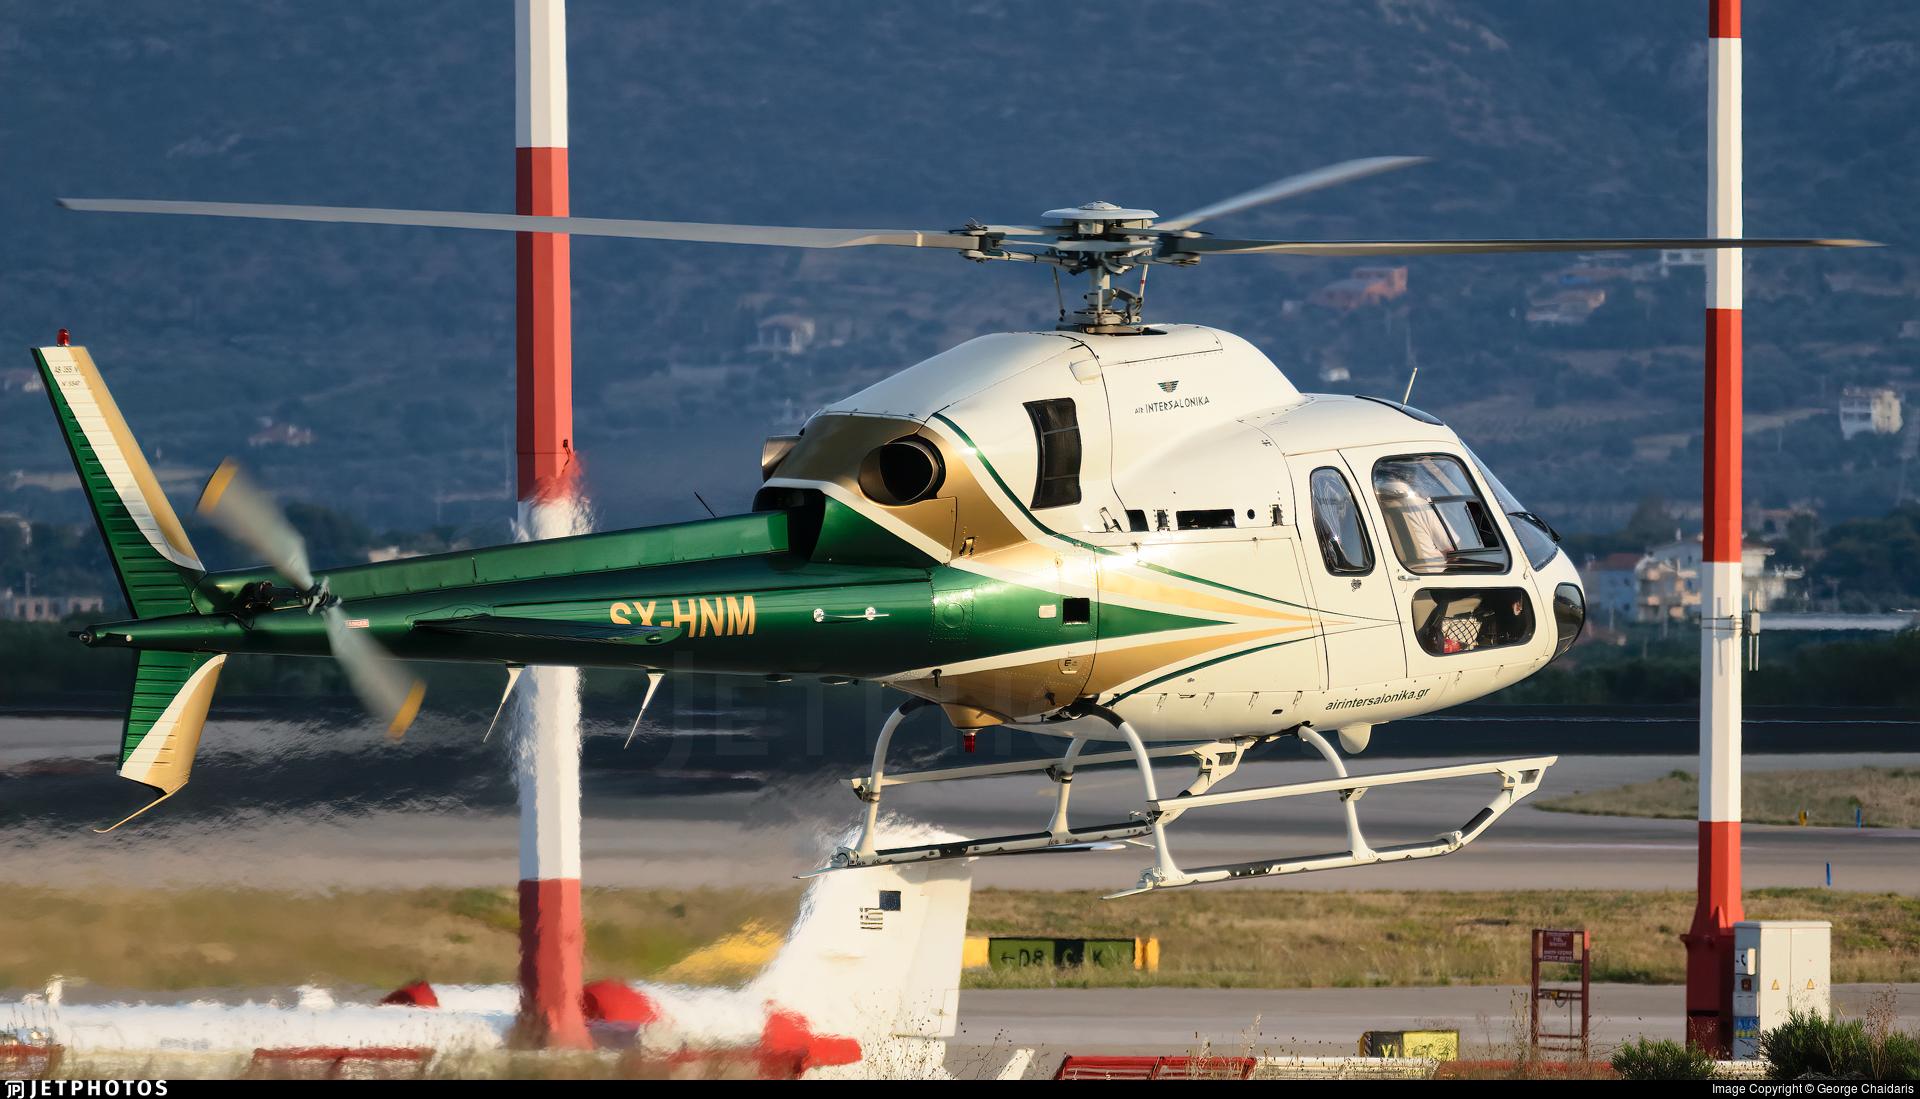 SX-HNM - Aérospatiale AS 355N Ecureuil 2 - Air Intersalonika